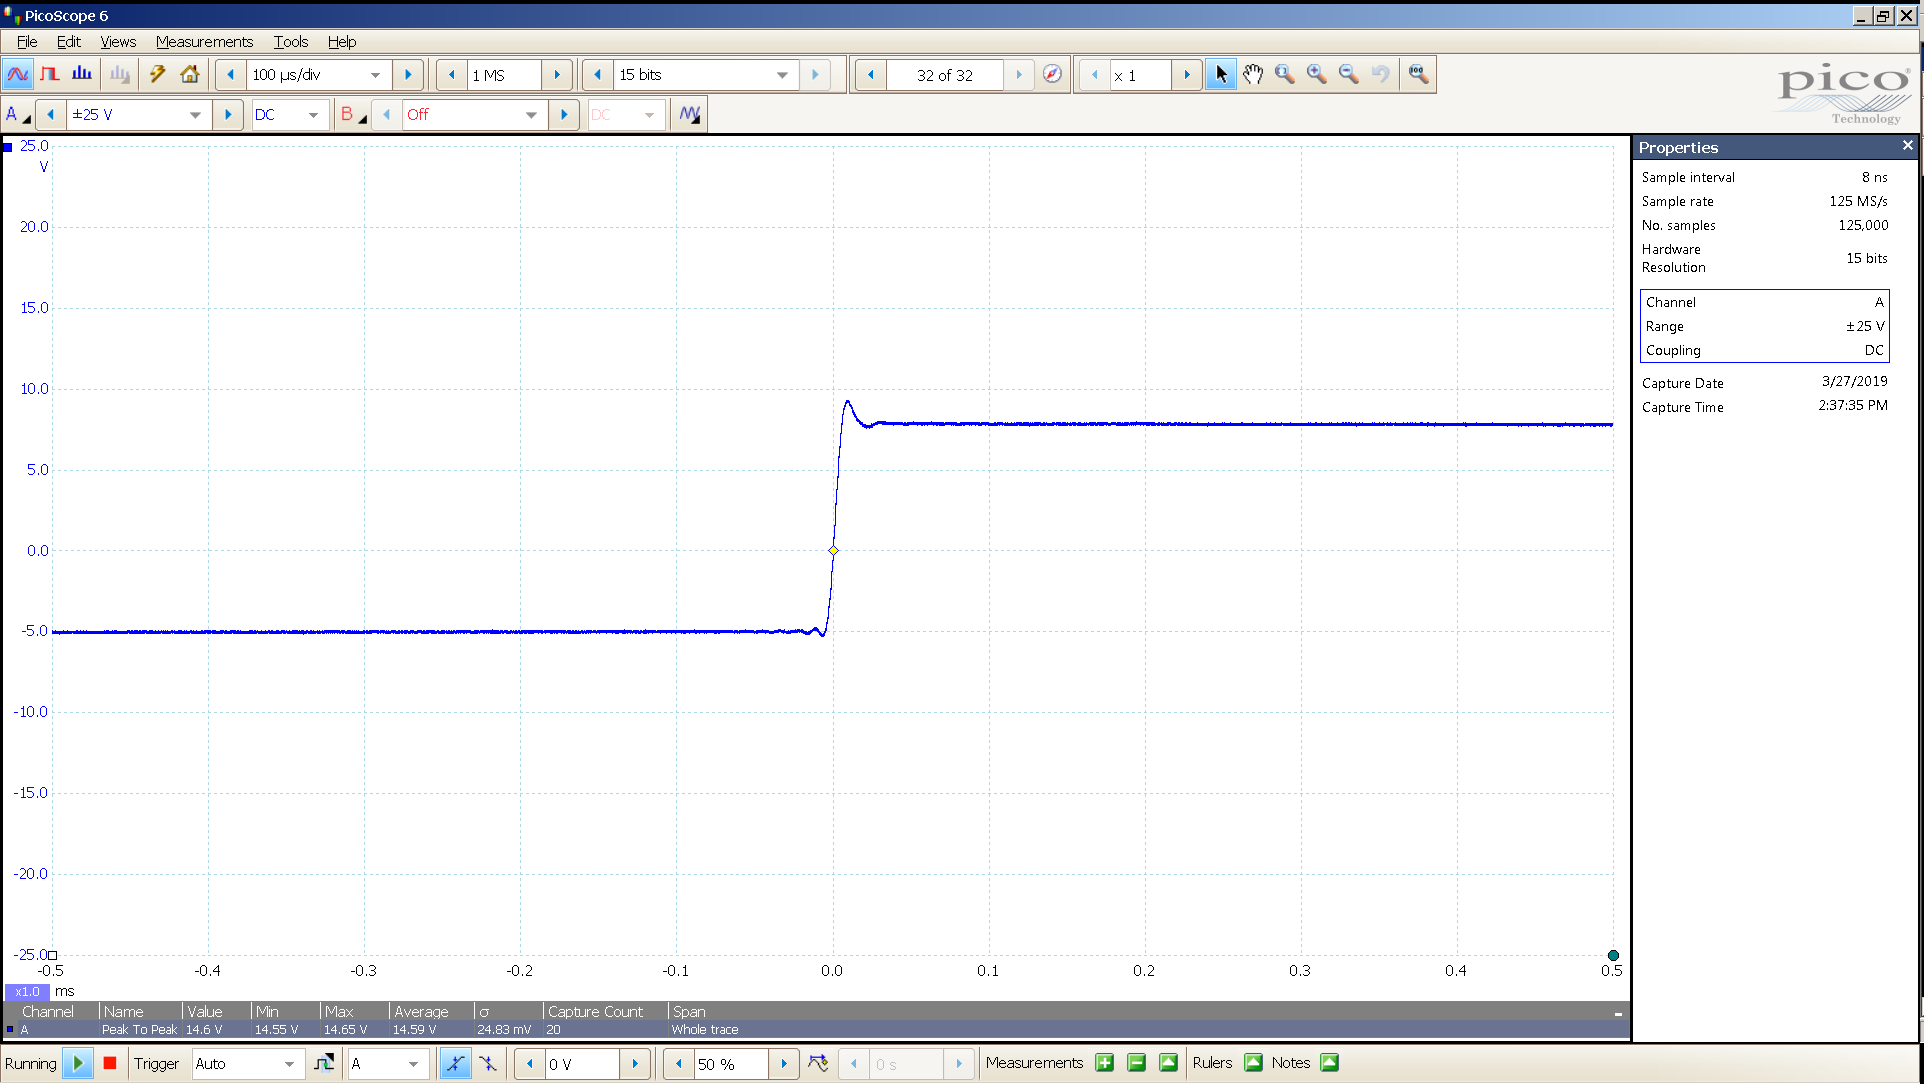 20190323-25 solaris Bal 20 Hz sqr -3 dBFS 16 Vpp 100uS div - AES 176K.PNG